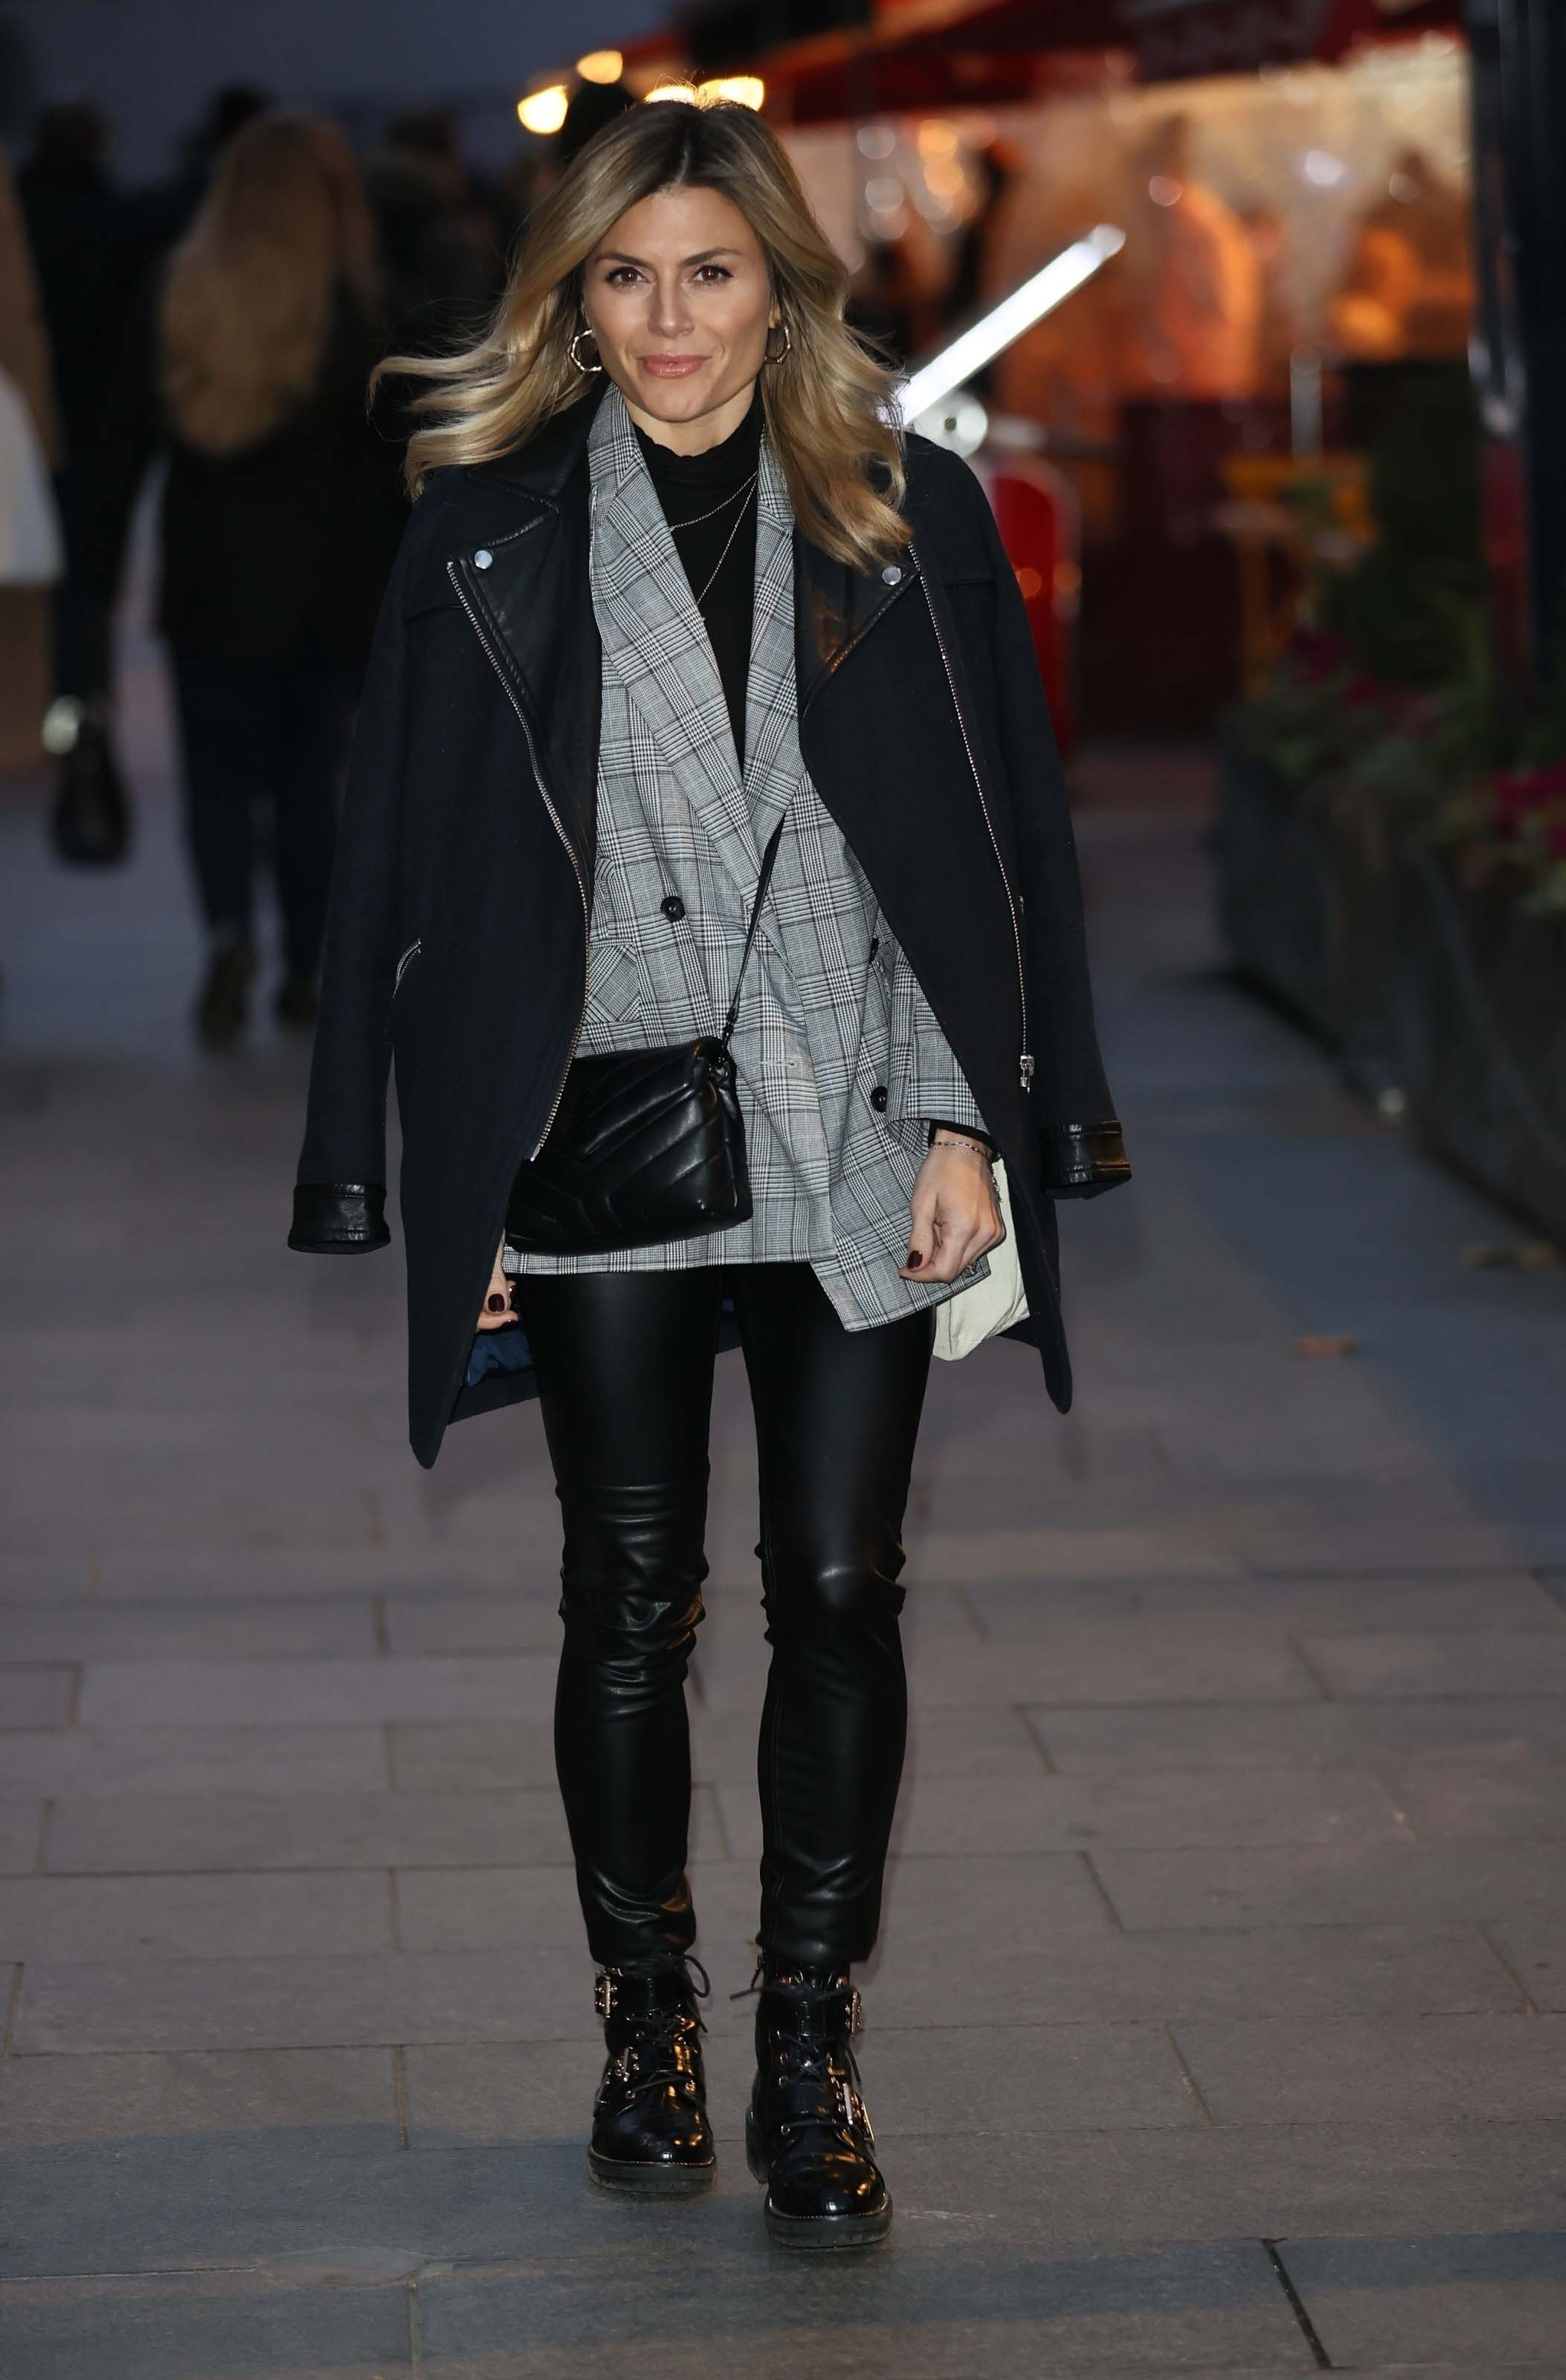 Zoe Hardman seen at Global offices in London